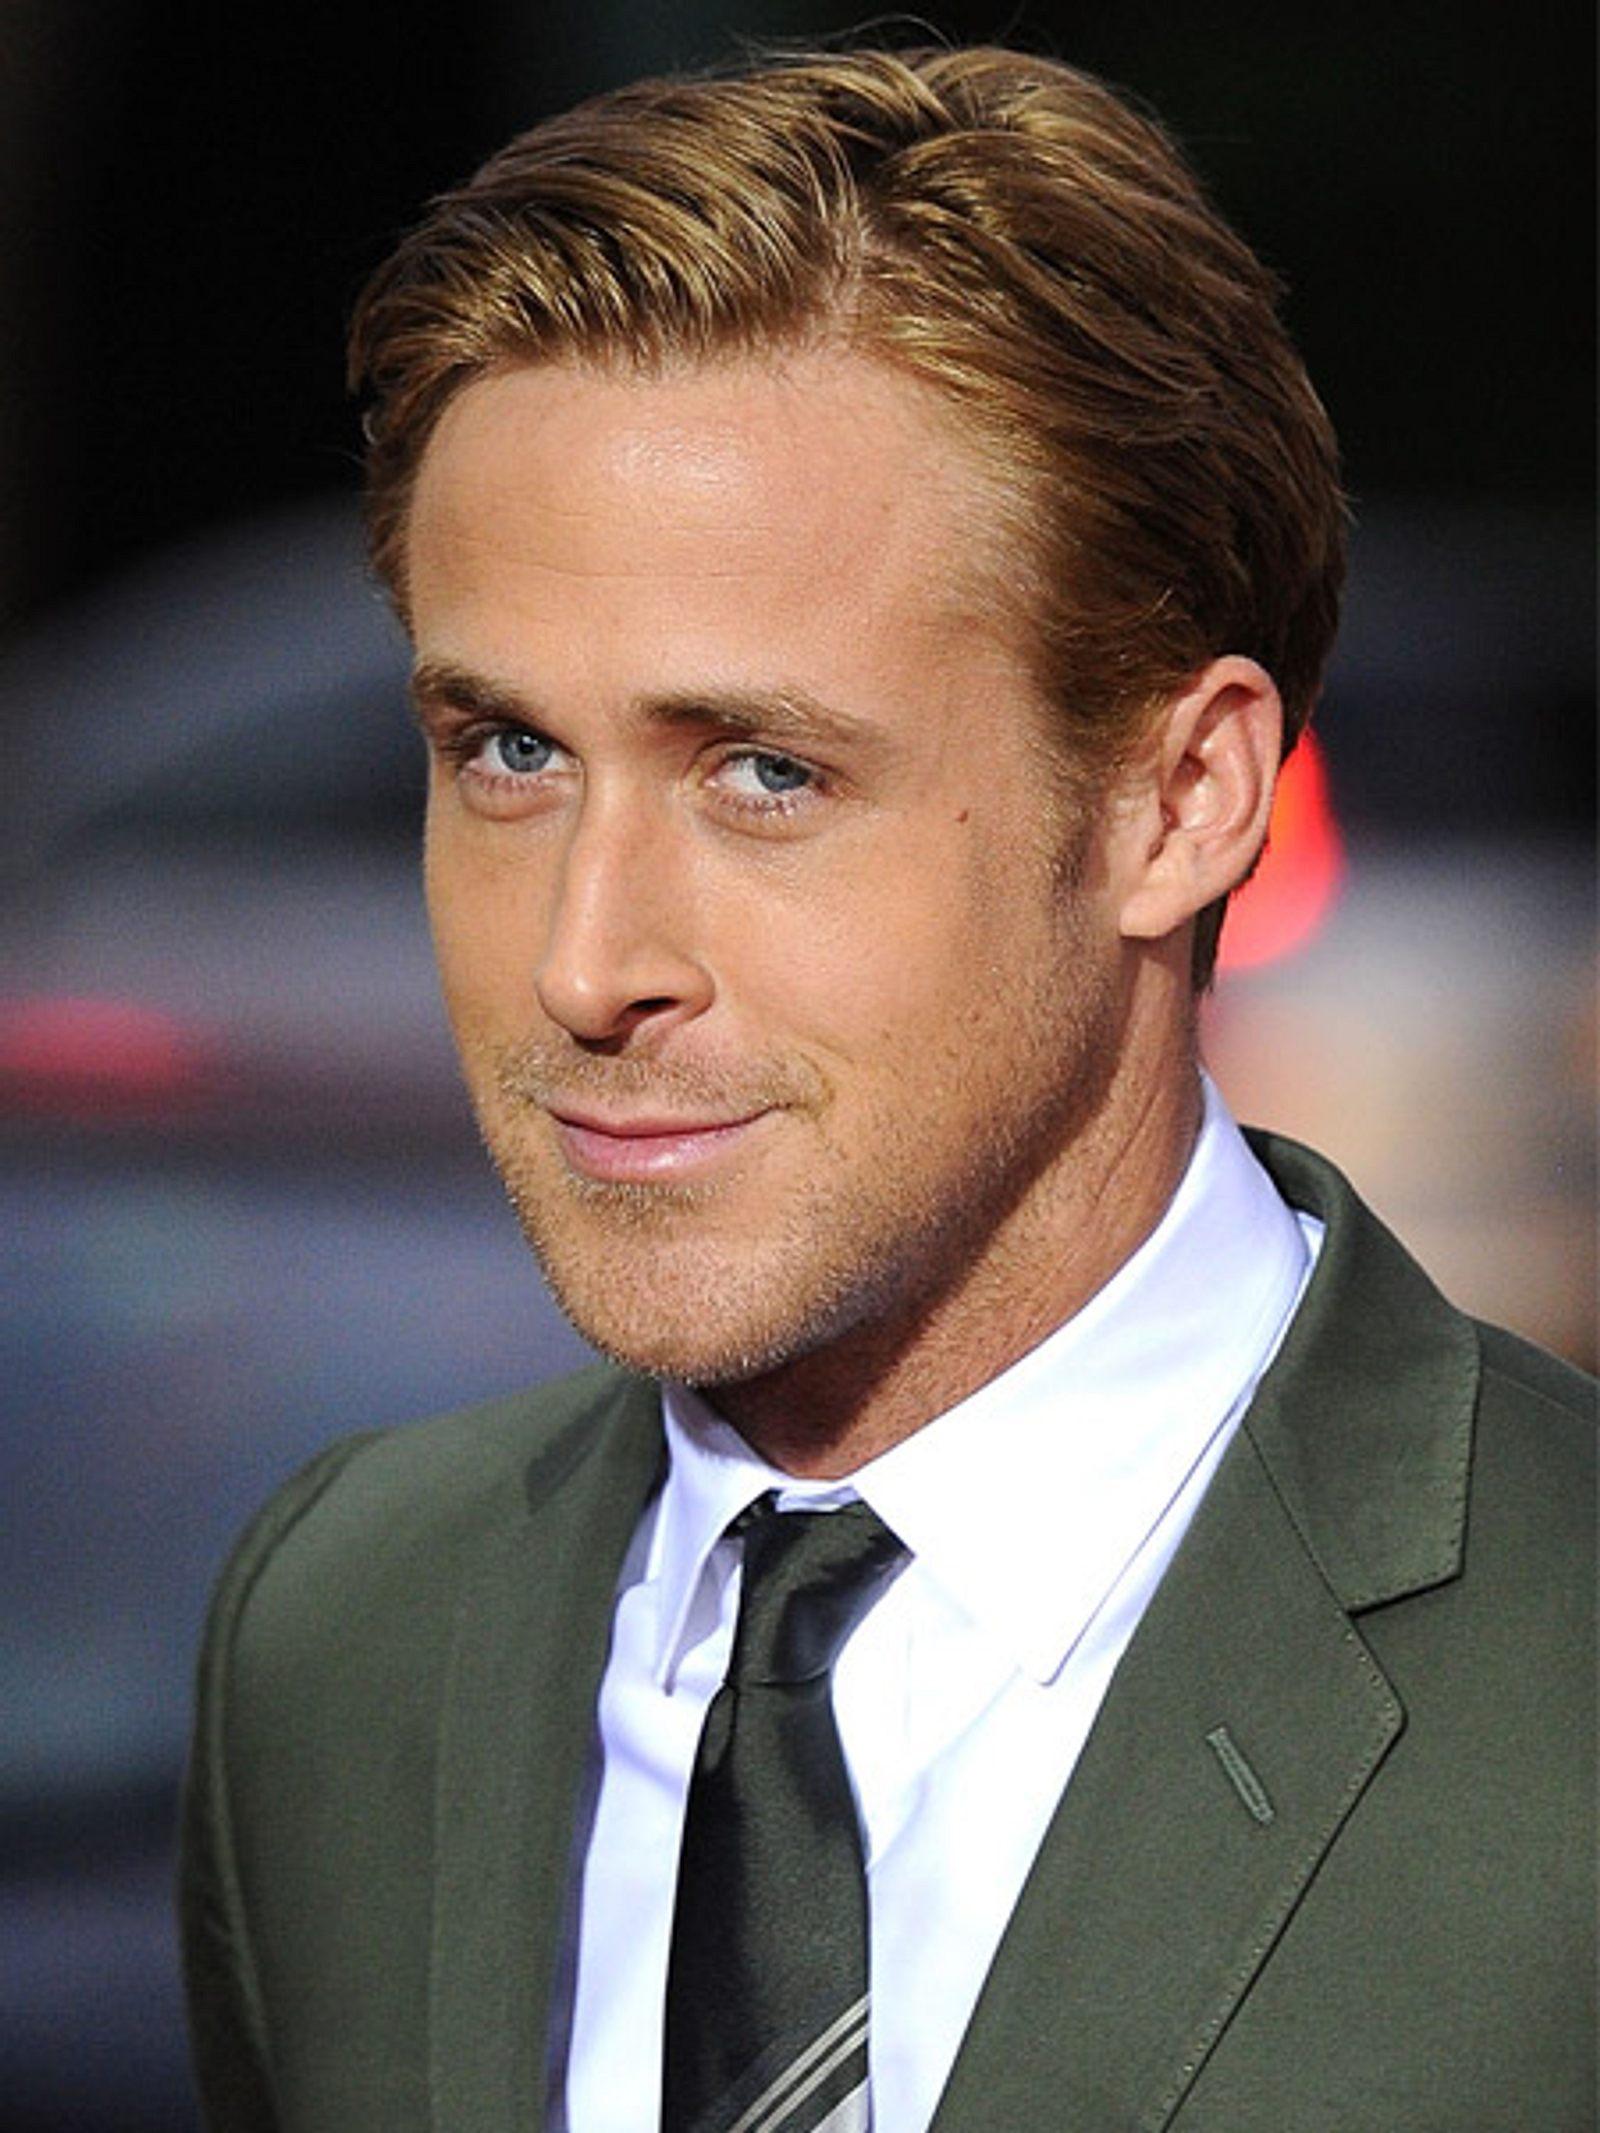 Watch Ryan Gosling Dance in Silver Lamé Hammer Pants